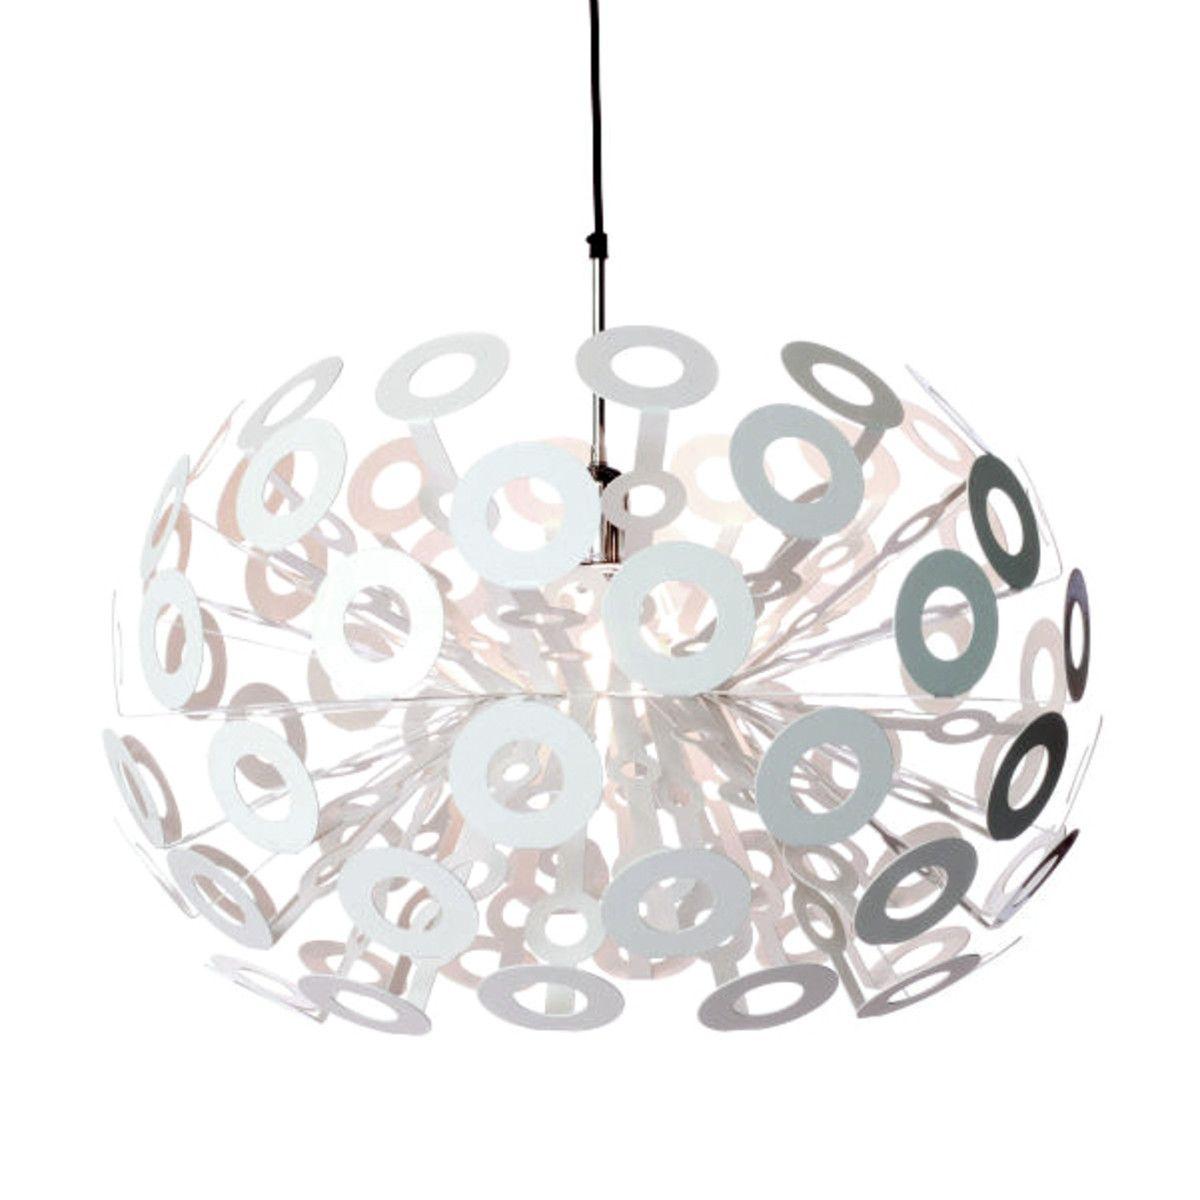 Richard hutten moooi dandelion pendant lamp aluminum pendant light see larger image audiocablefo